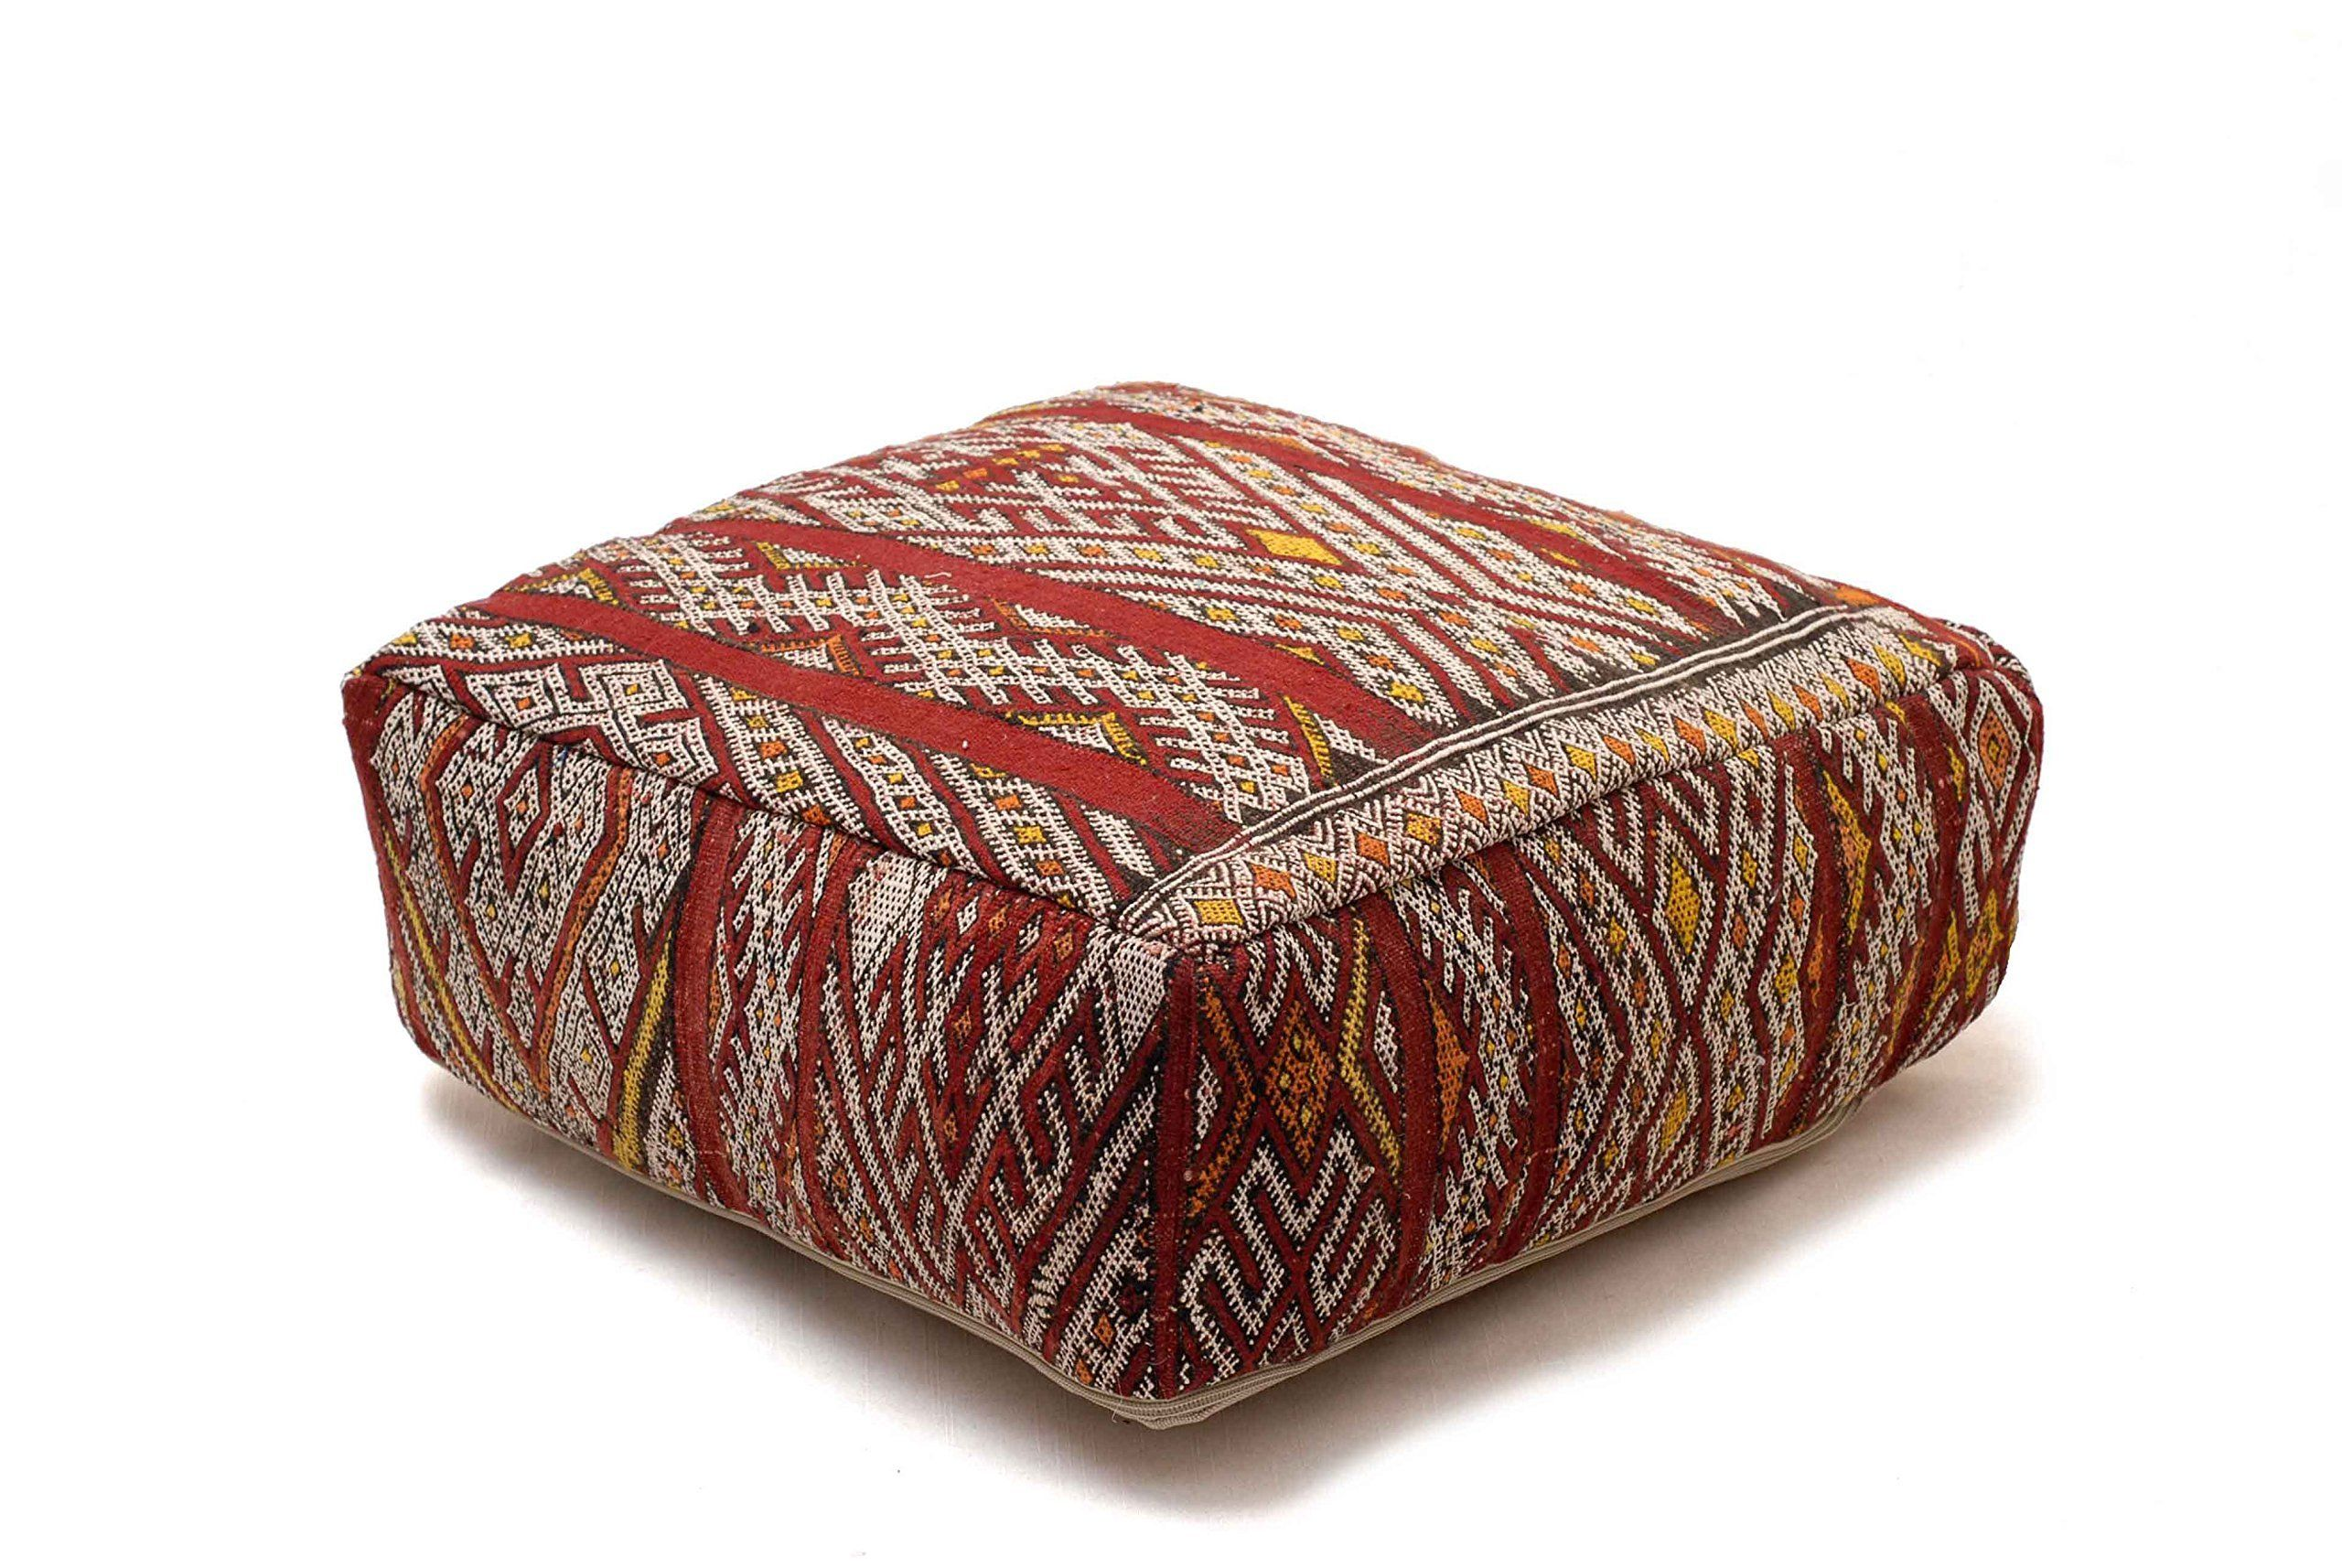 Moroccan Kilim Floor Pillow Pouf Cover Berber Handmade Bohemian